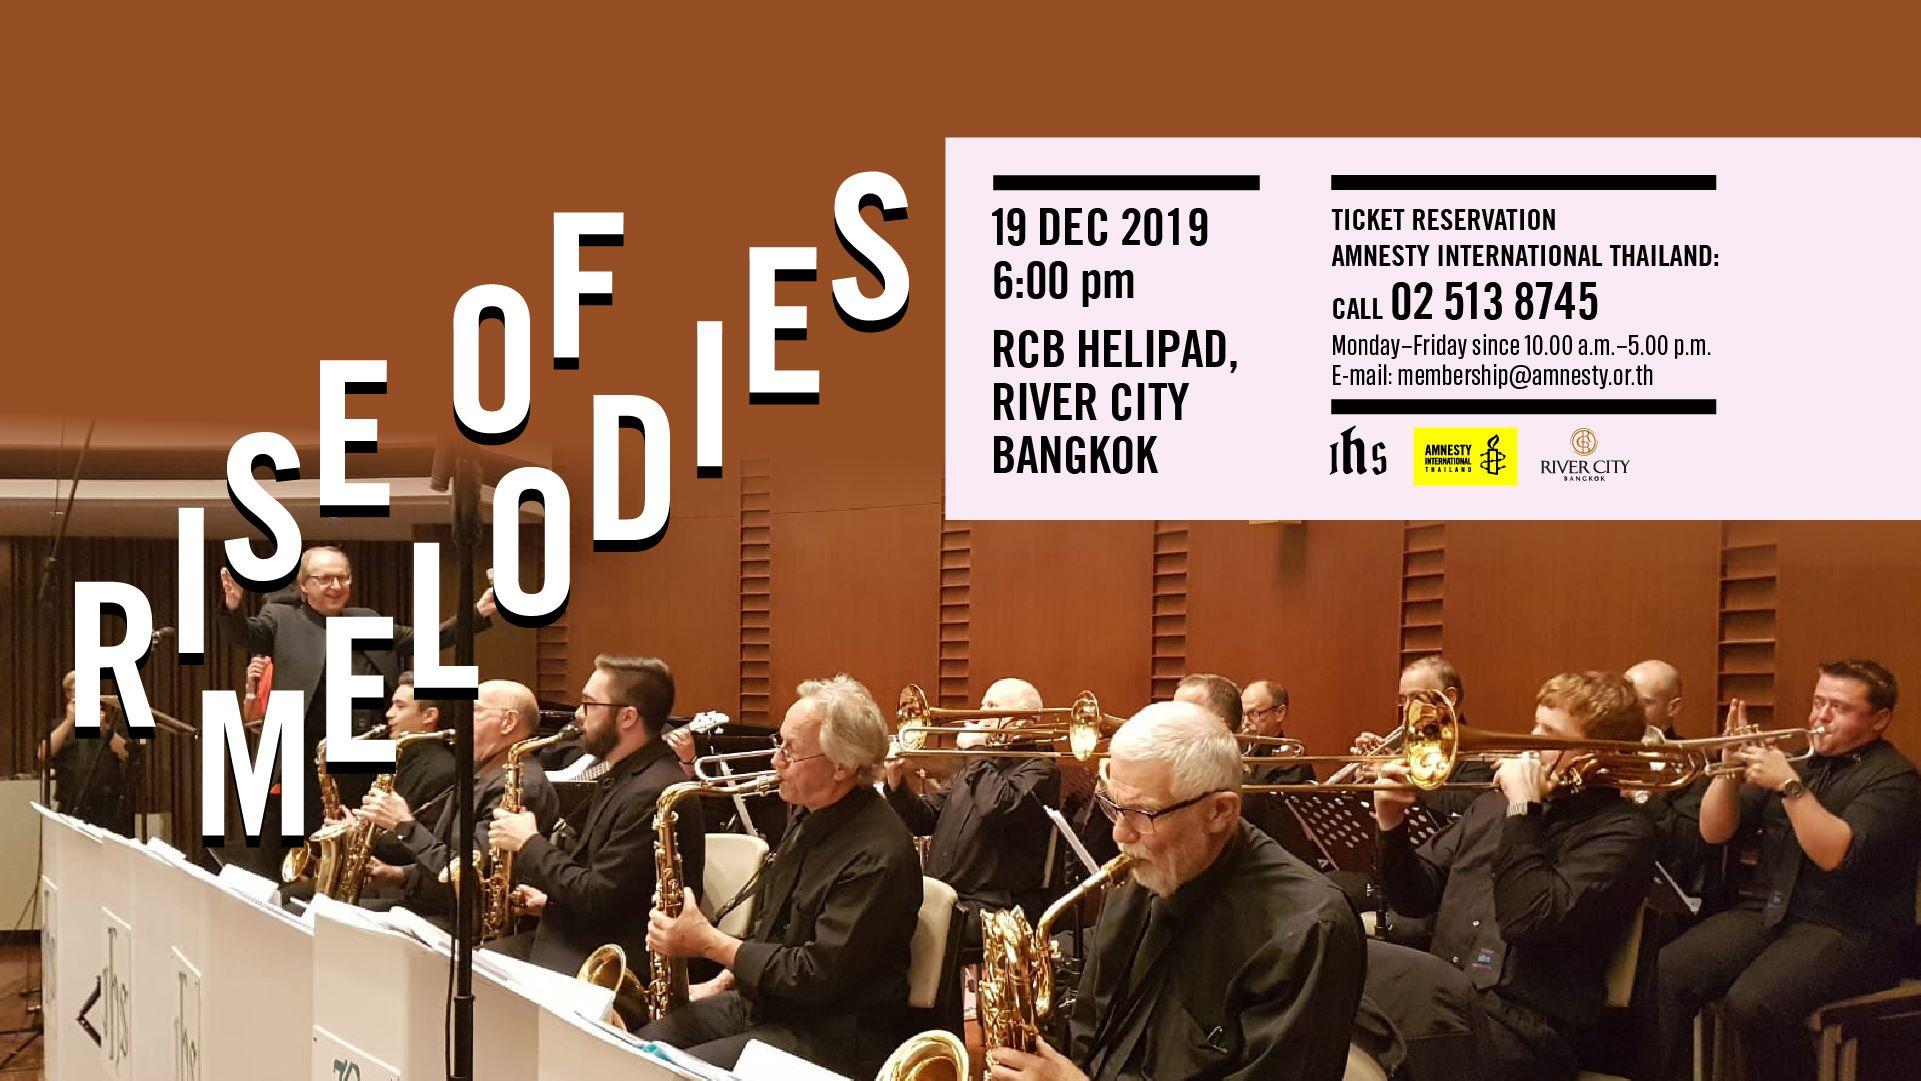 The IHS World Orchestra 'Rise of Melodies' ดื่มด่ำกับวงออเคสตร้าระดับโลก